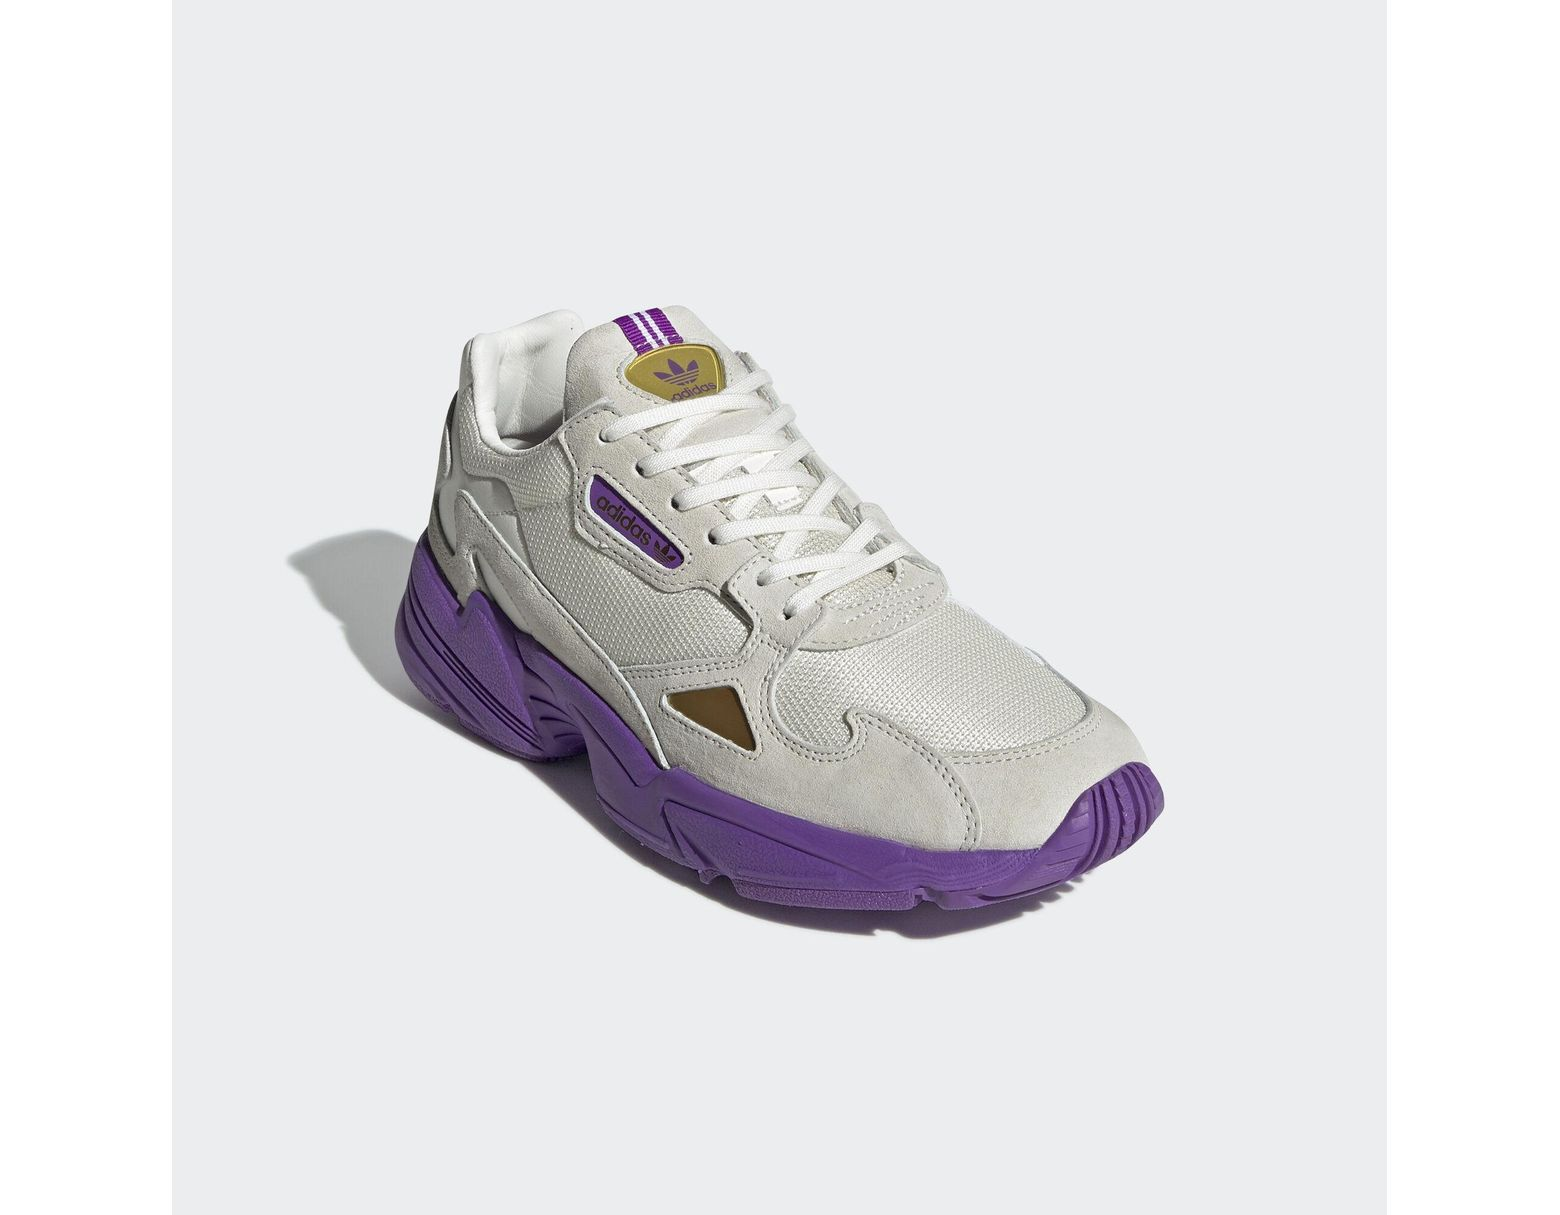 Speedfactory Am4la Adicon Adidas Shoe Me kXZiuTOP